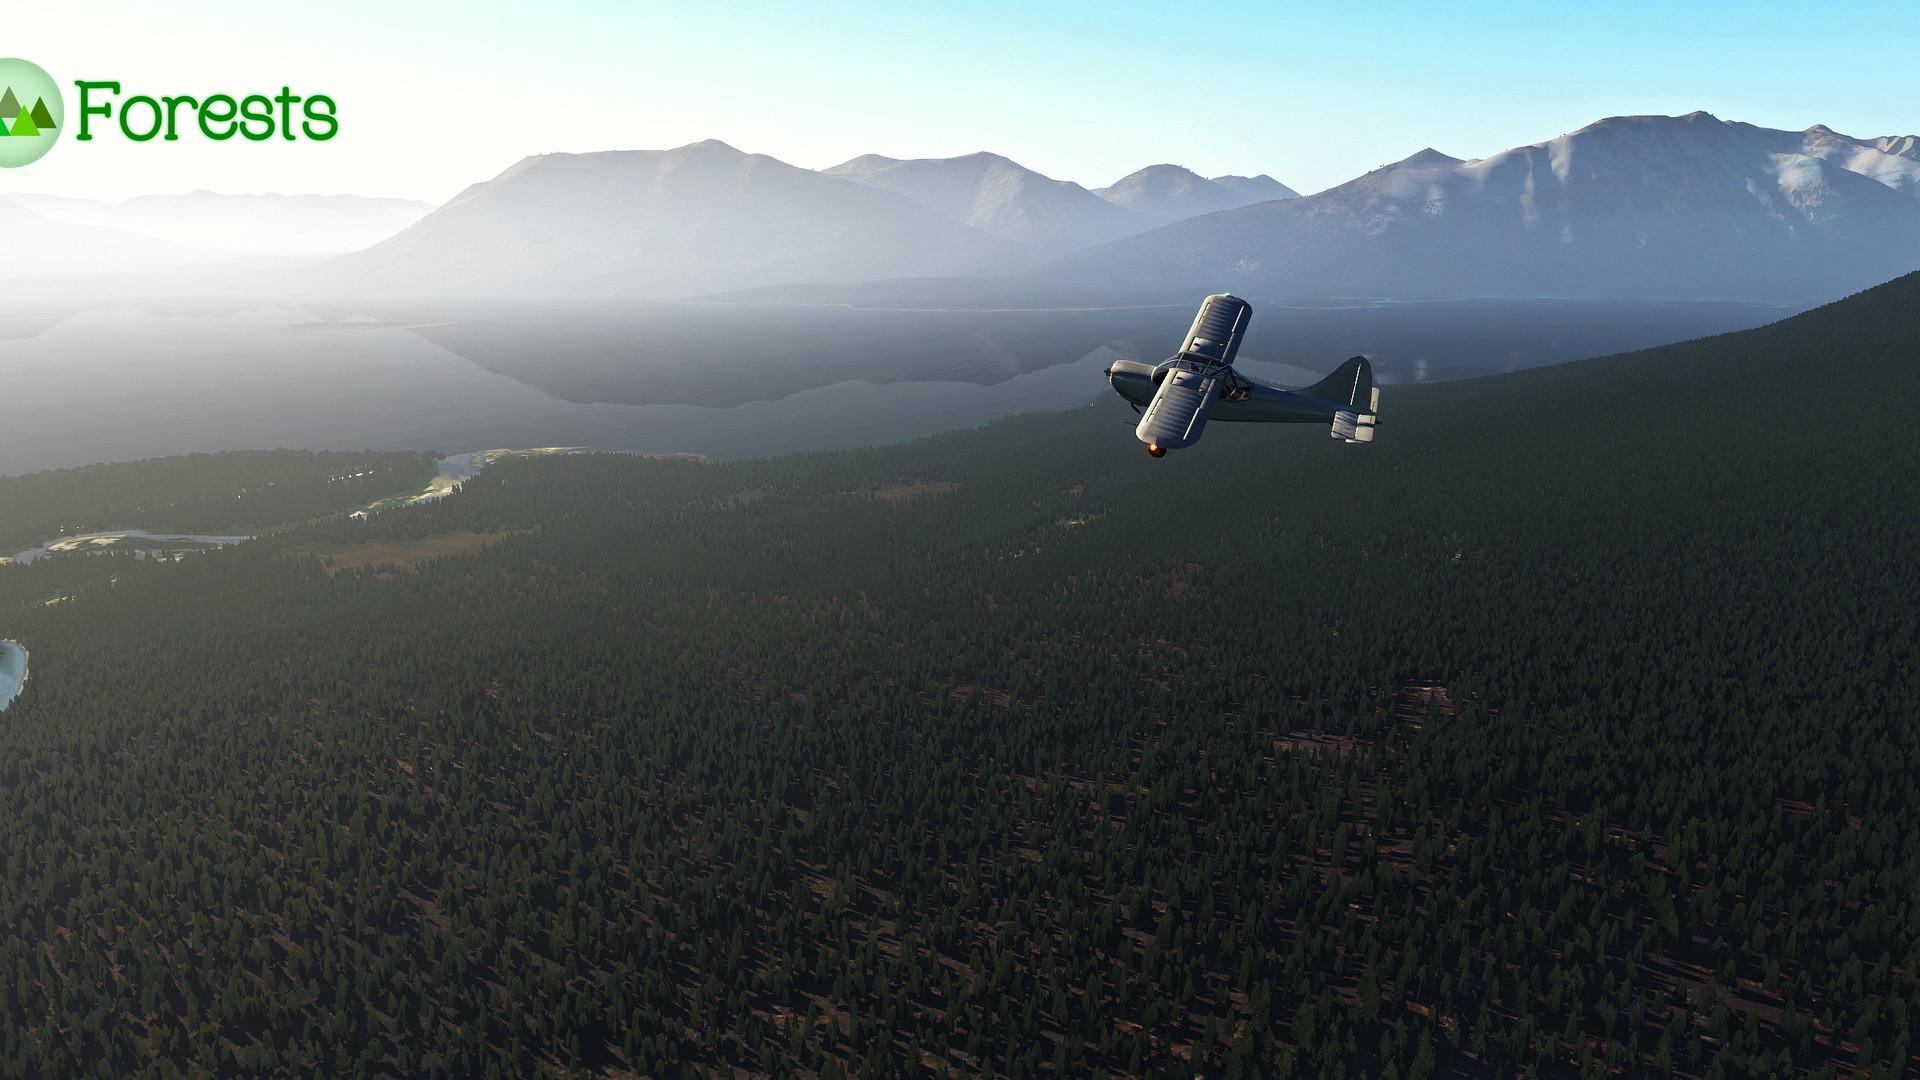 Global_Forests_Alaska2.jpg